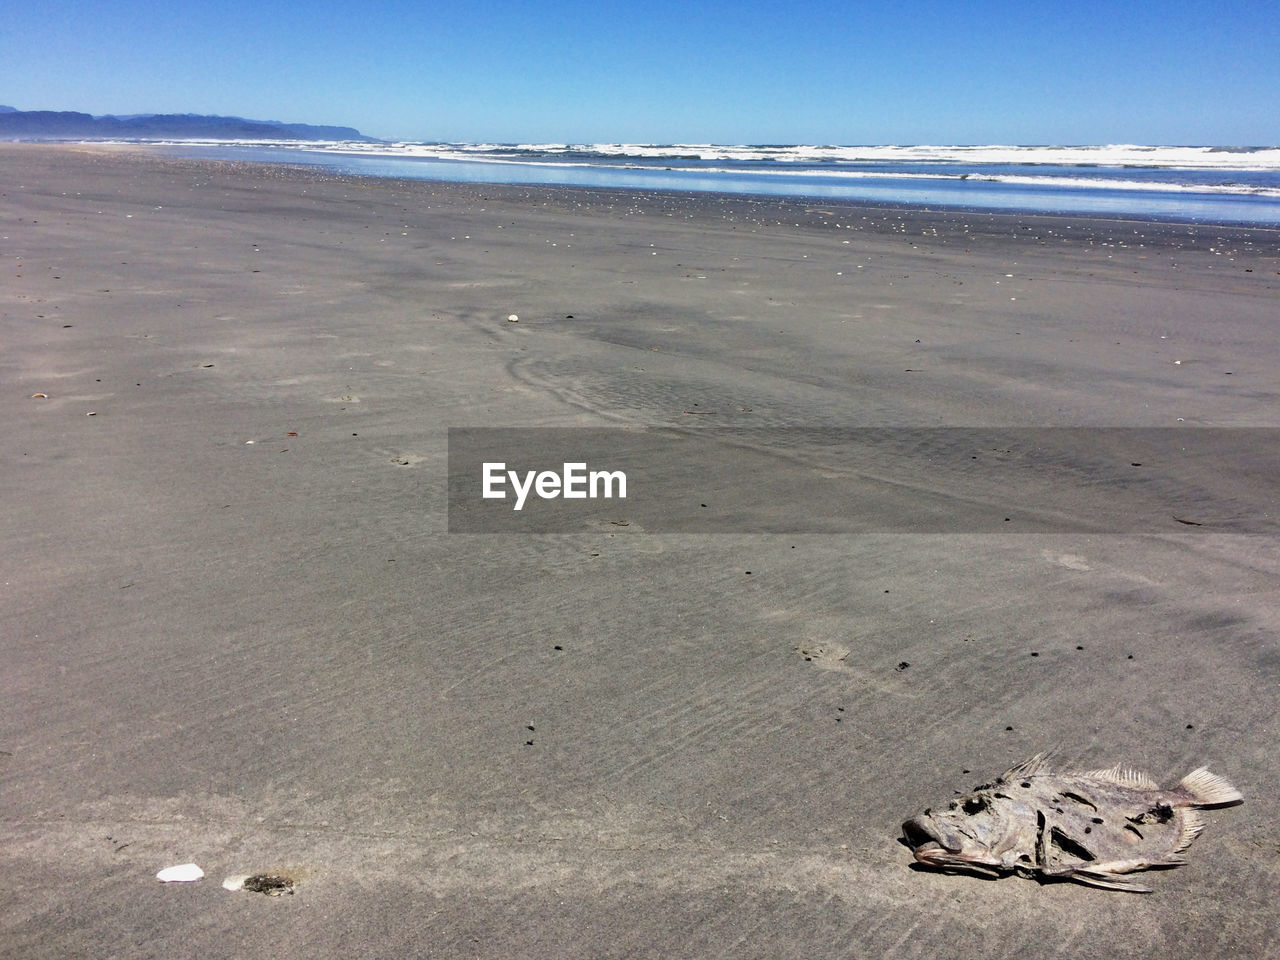 Fish skeleton on beach